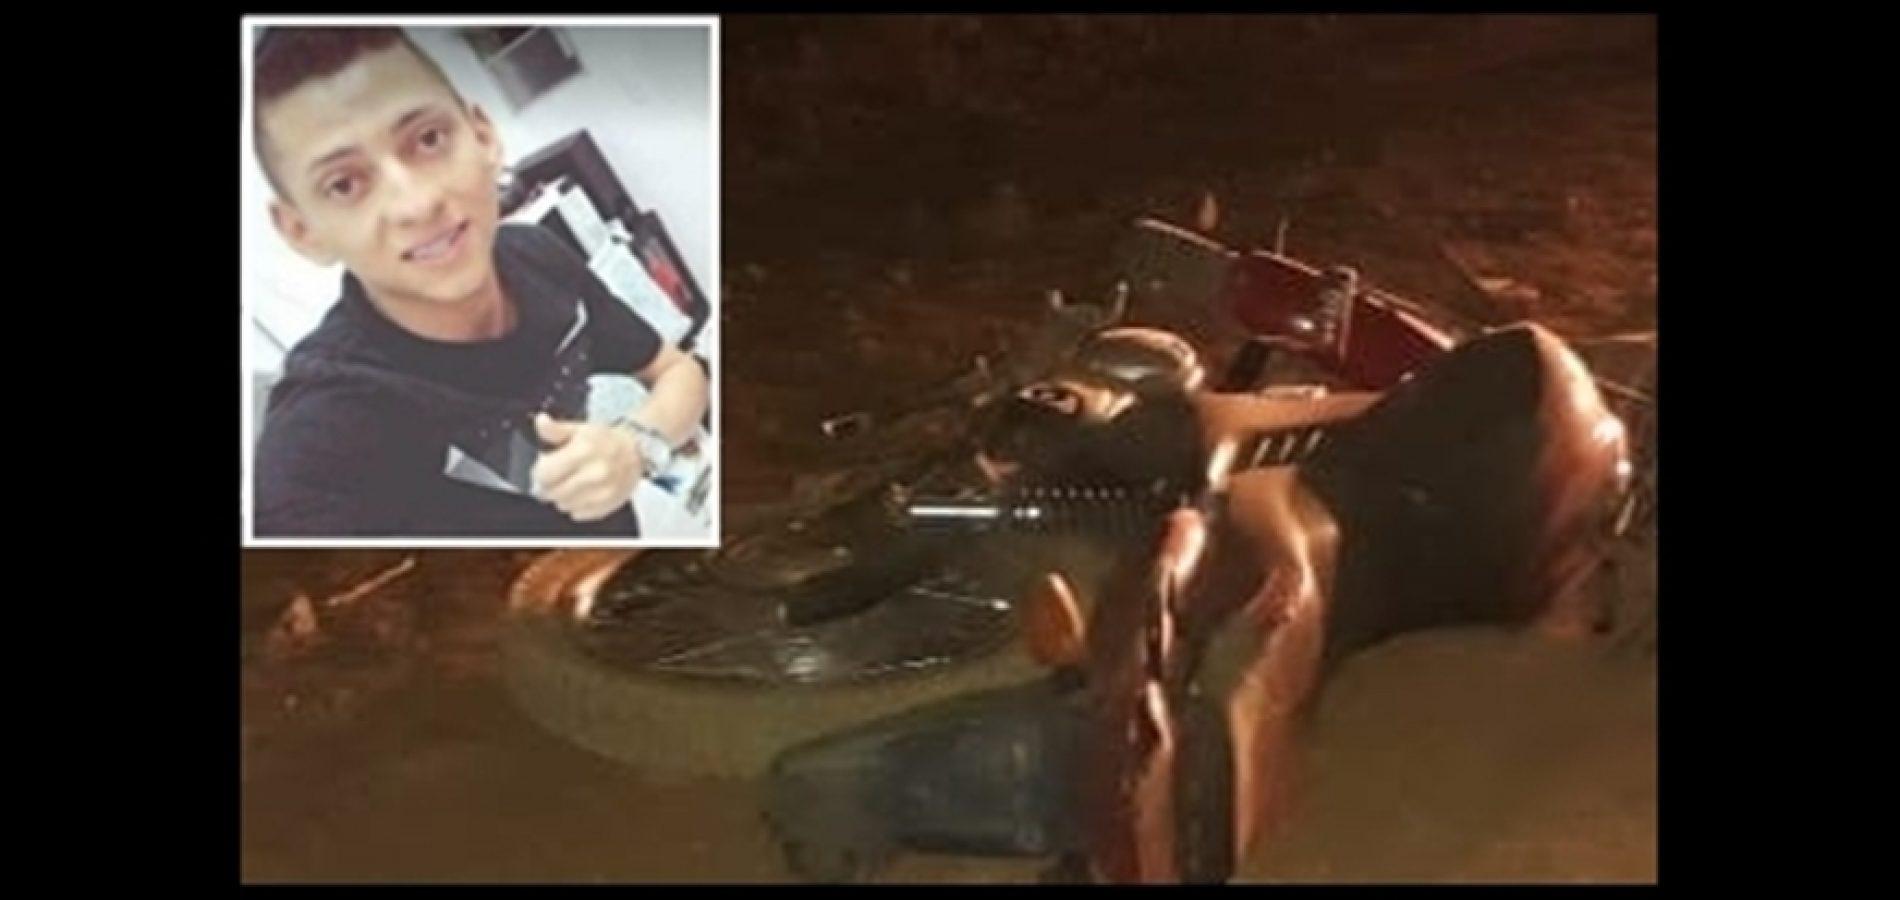 Jovem de 23 anos morreu após perder controle de moto